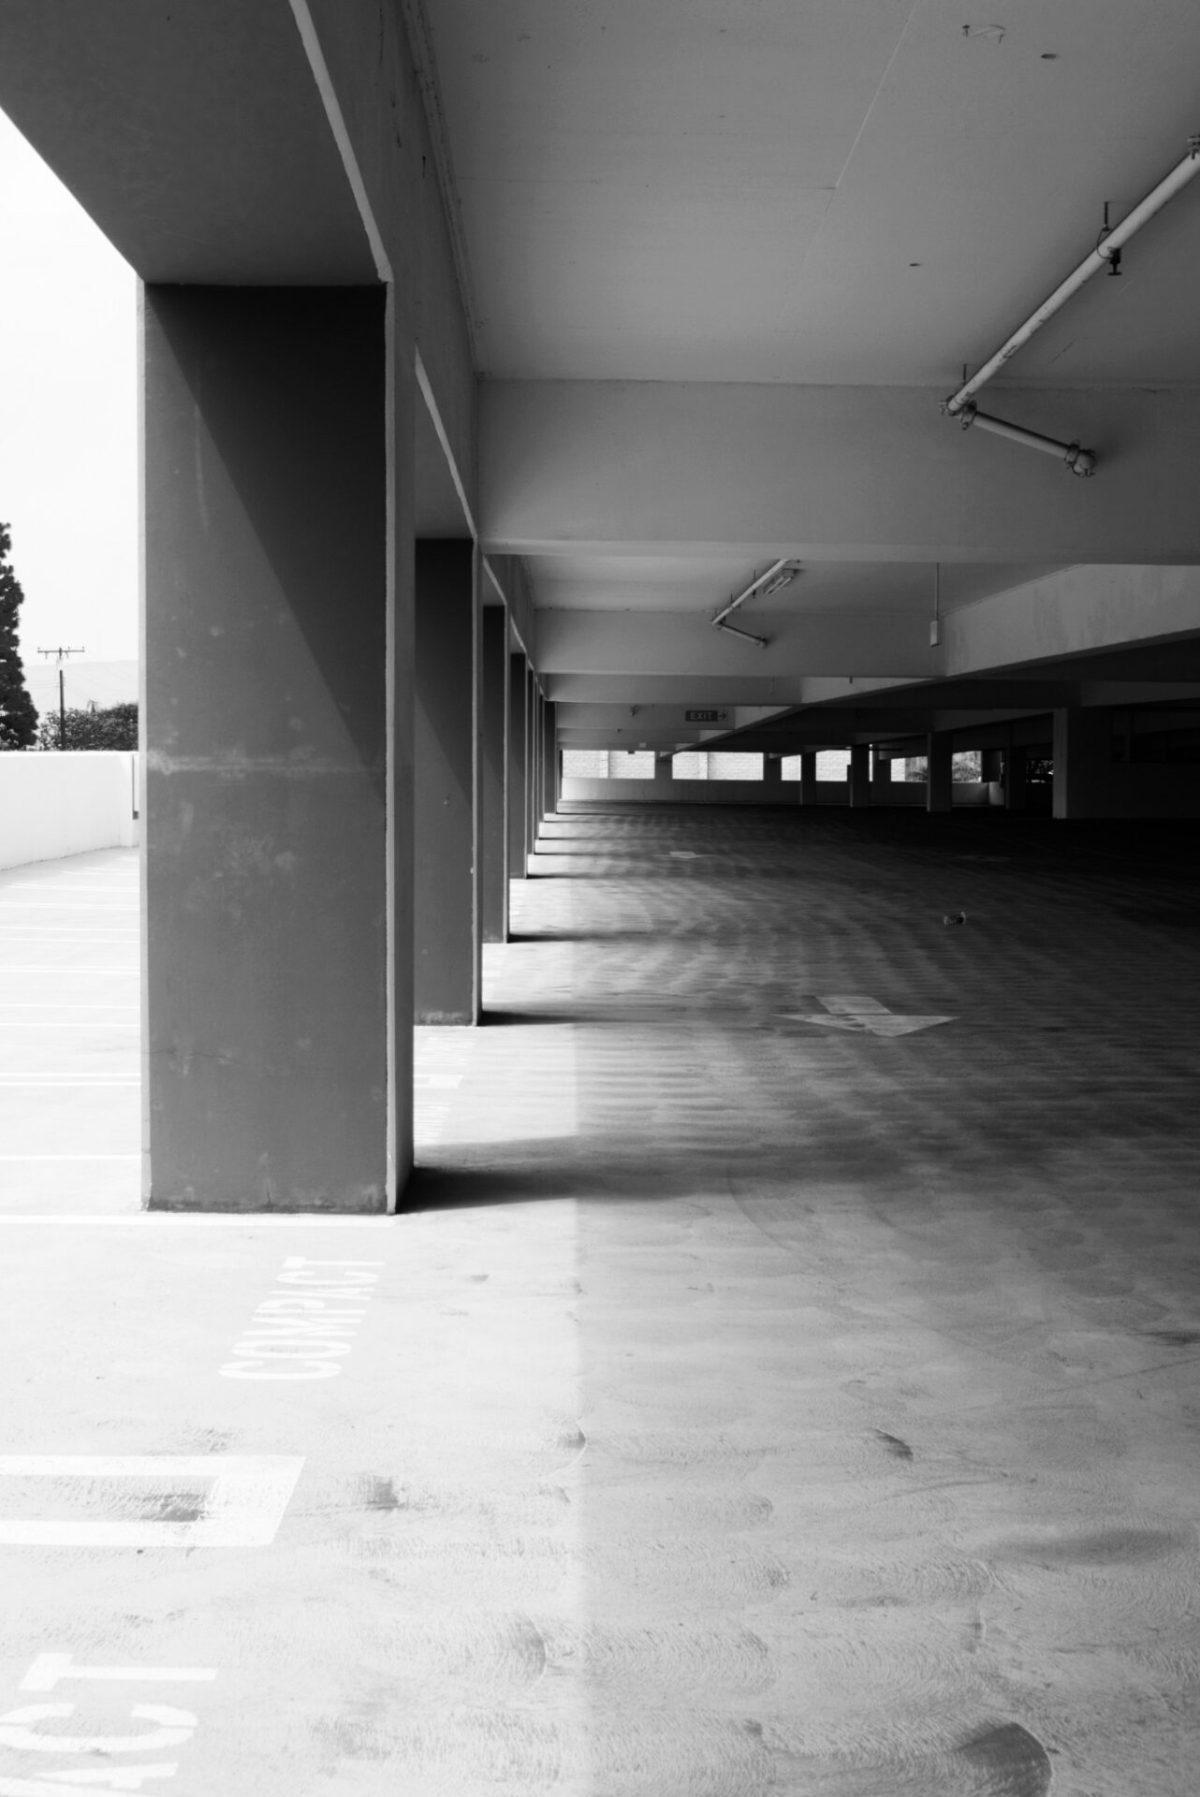 Parking structure photos at EvFree Fullerton 1